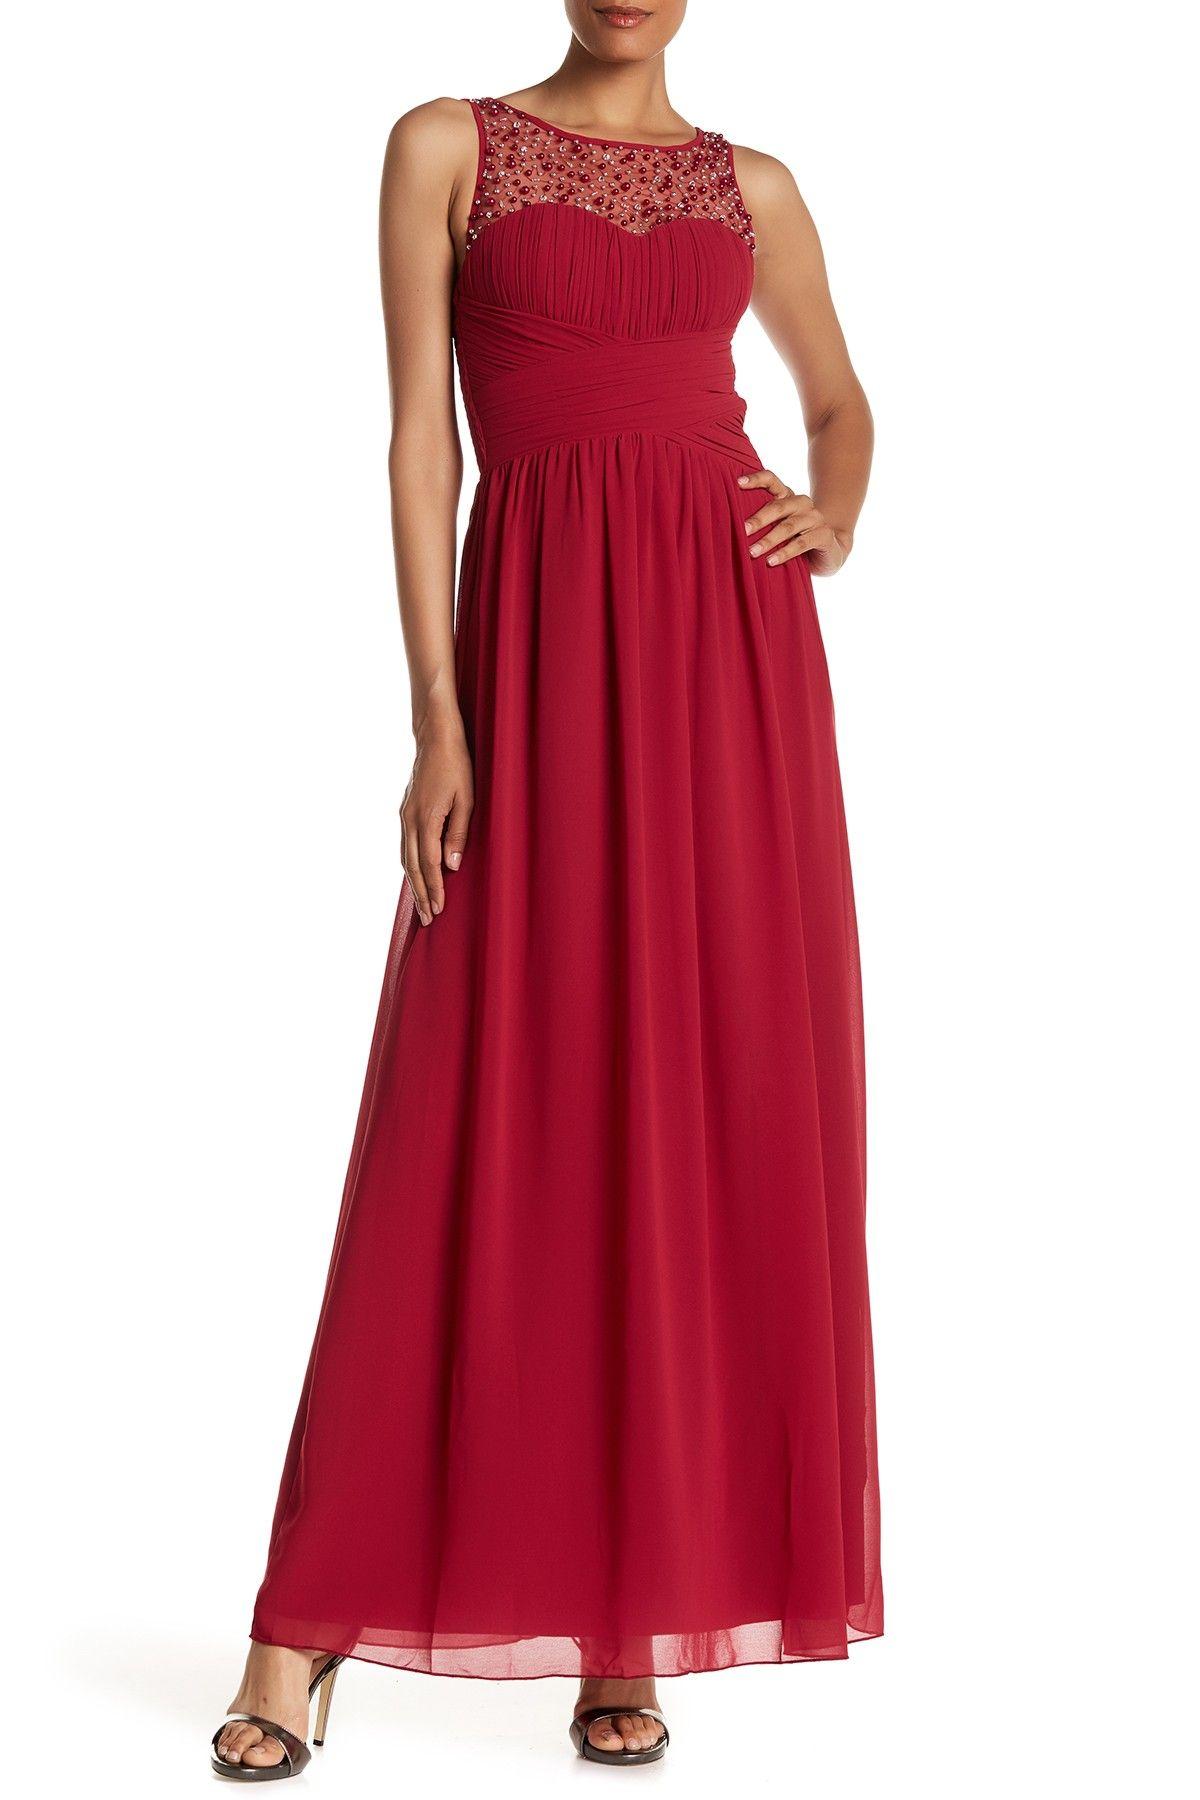 Embellished maxi dress by little mistress on hautelook dresses